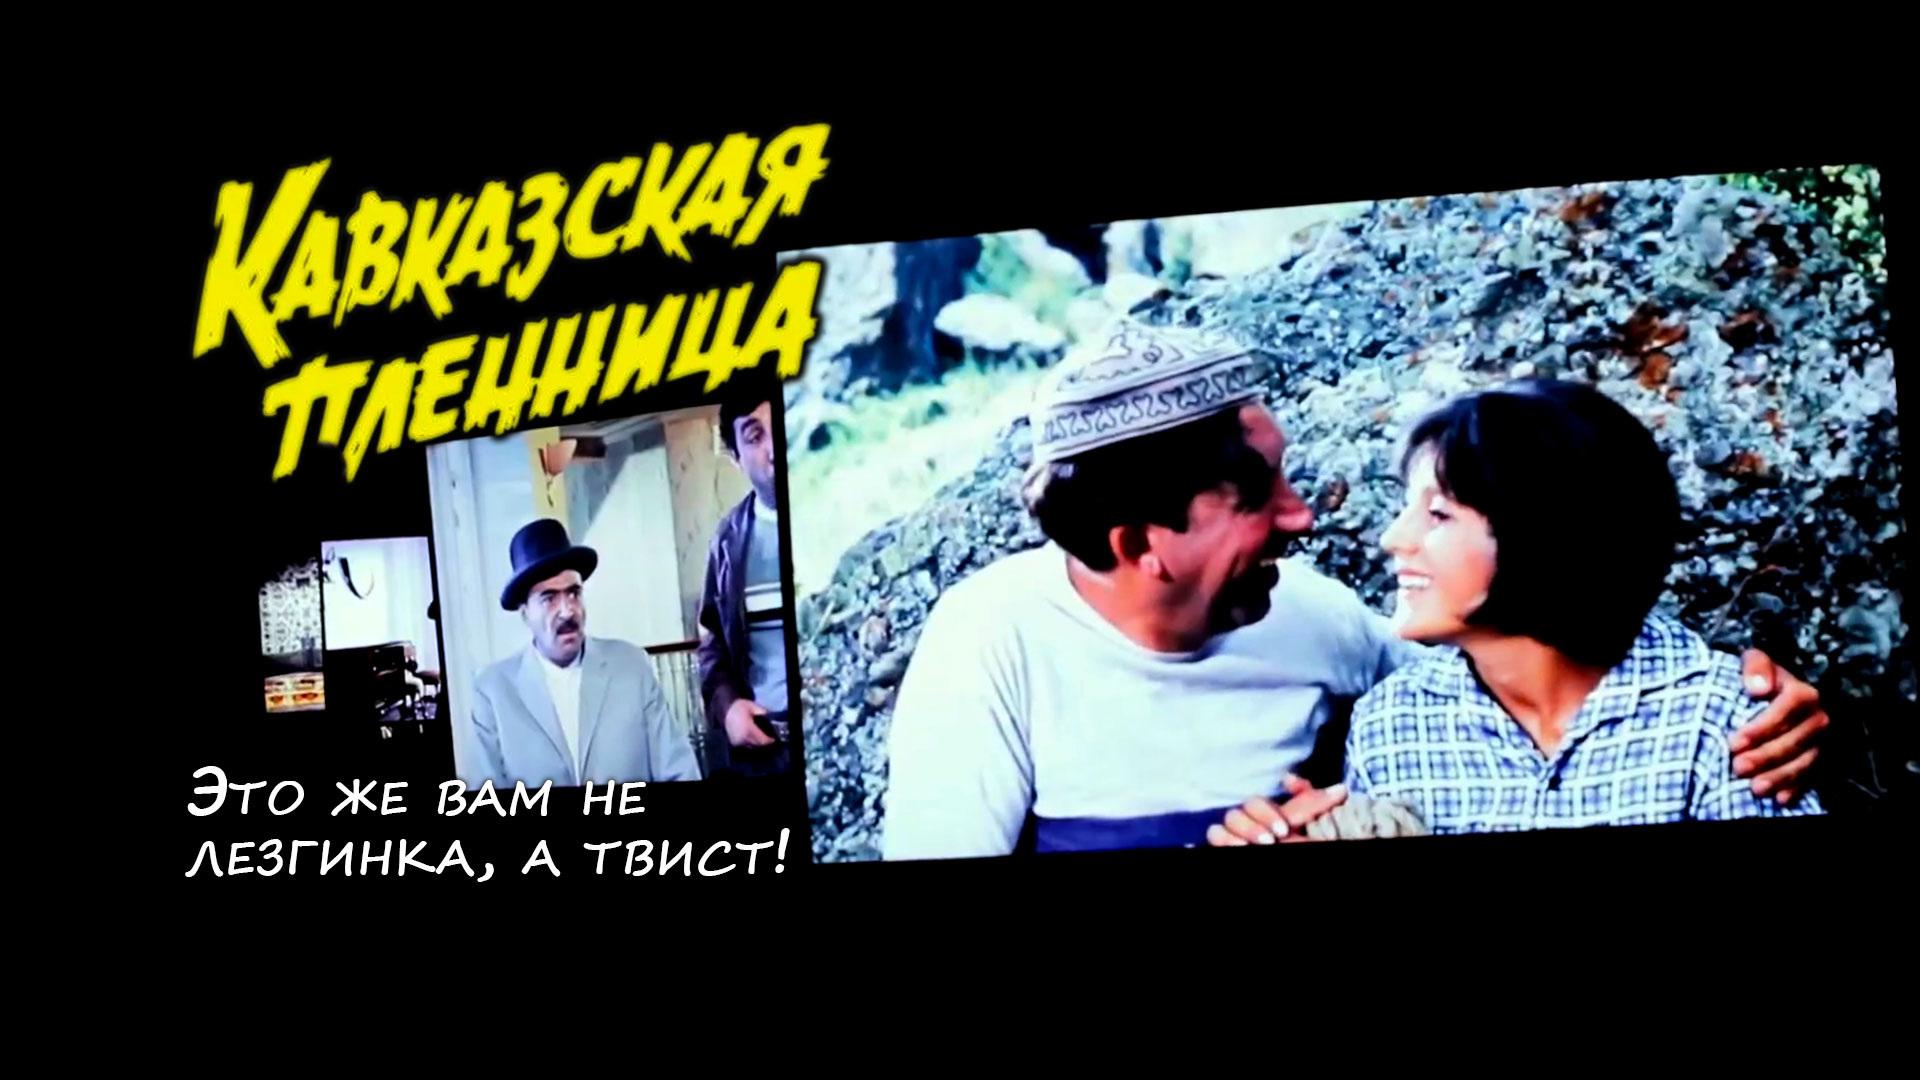 """Кавказская пленница"". Это же вам не лезгинка, а твист!"